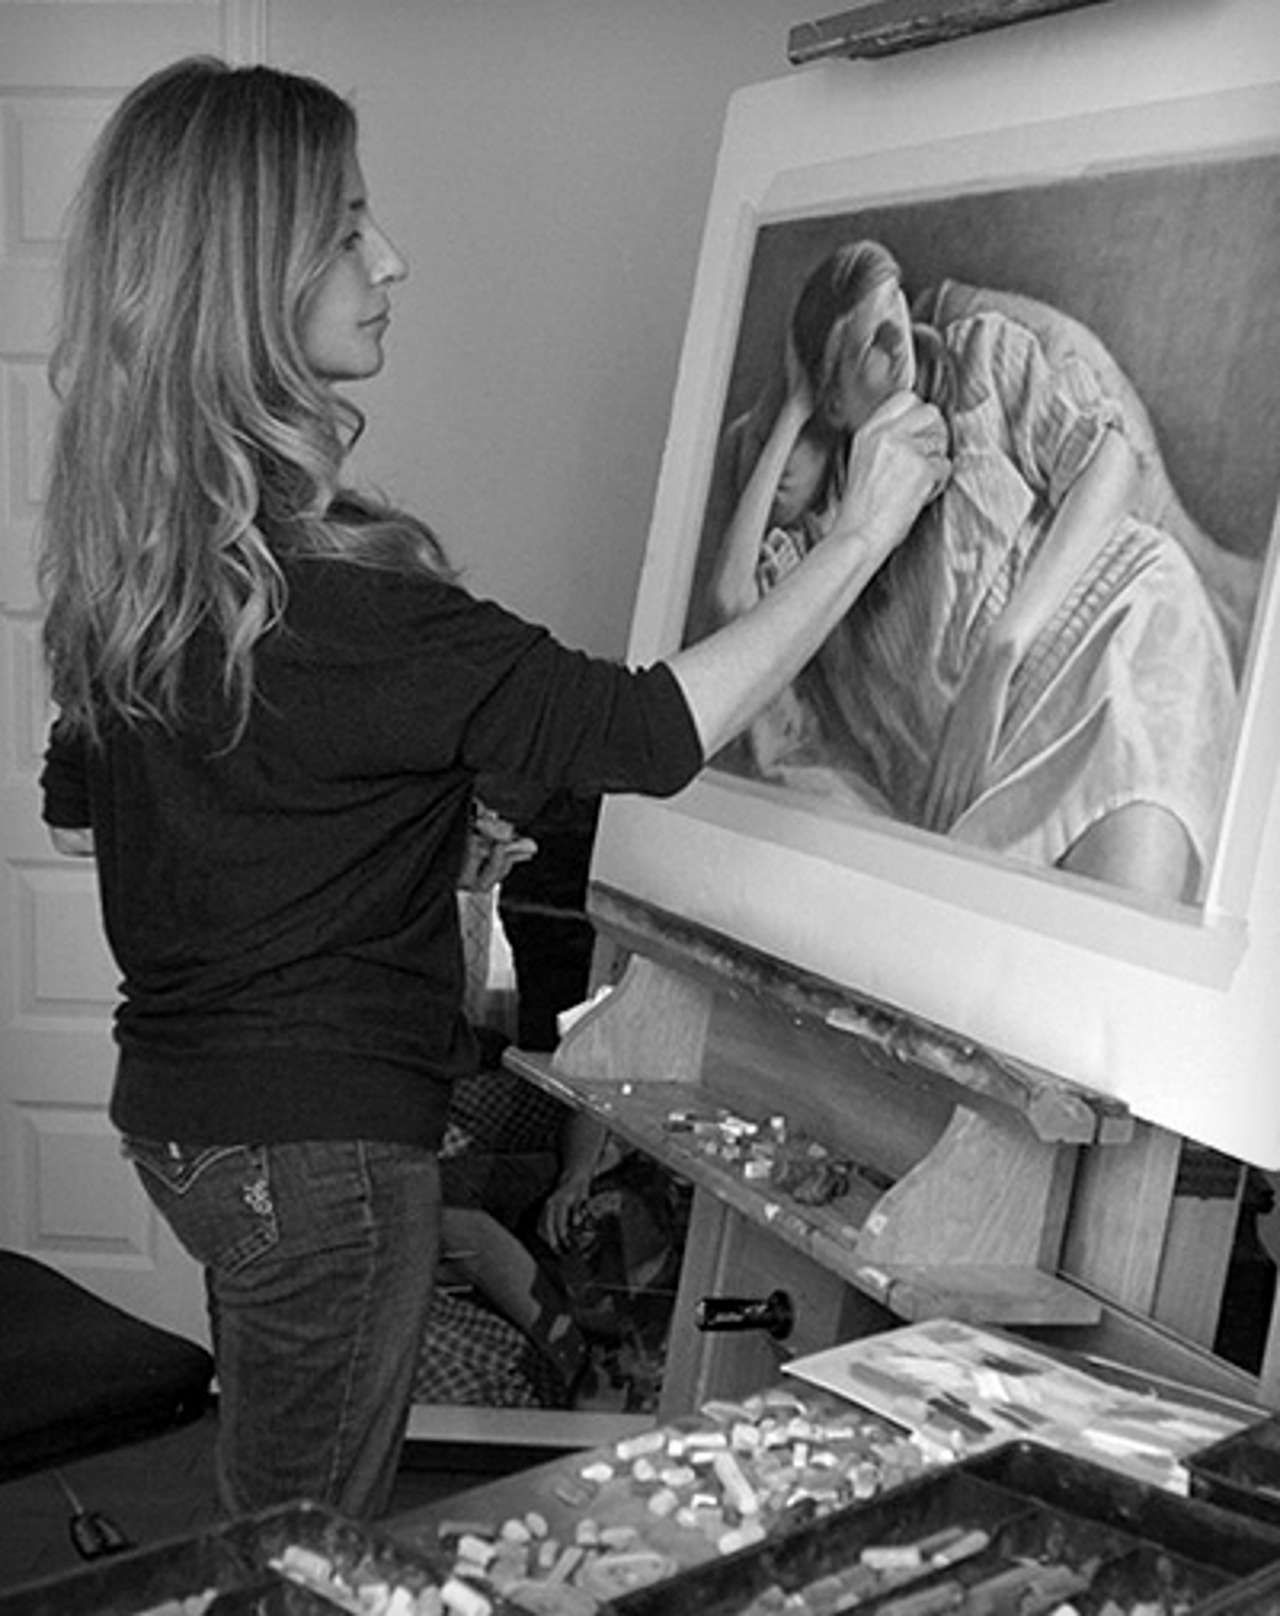 danielle richards art | The Art Edge: Interview with artist Danielle Richard - Part 2